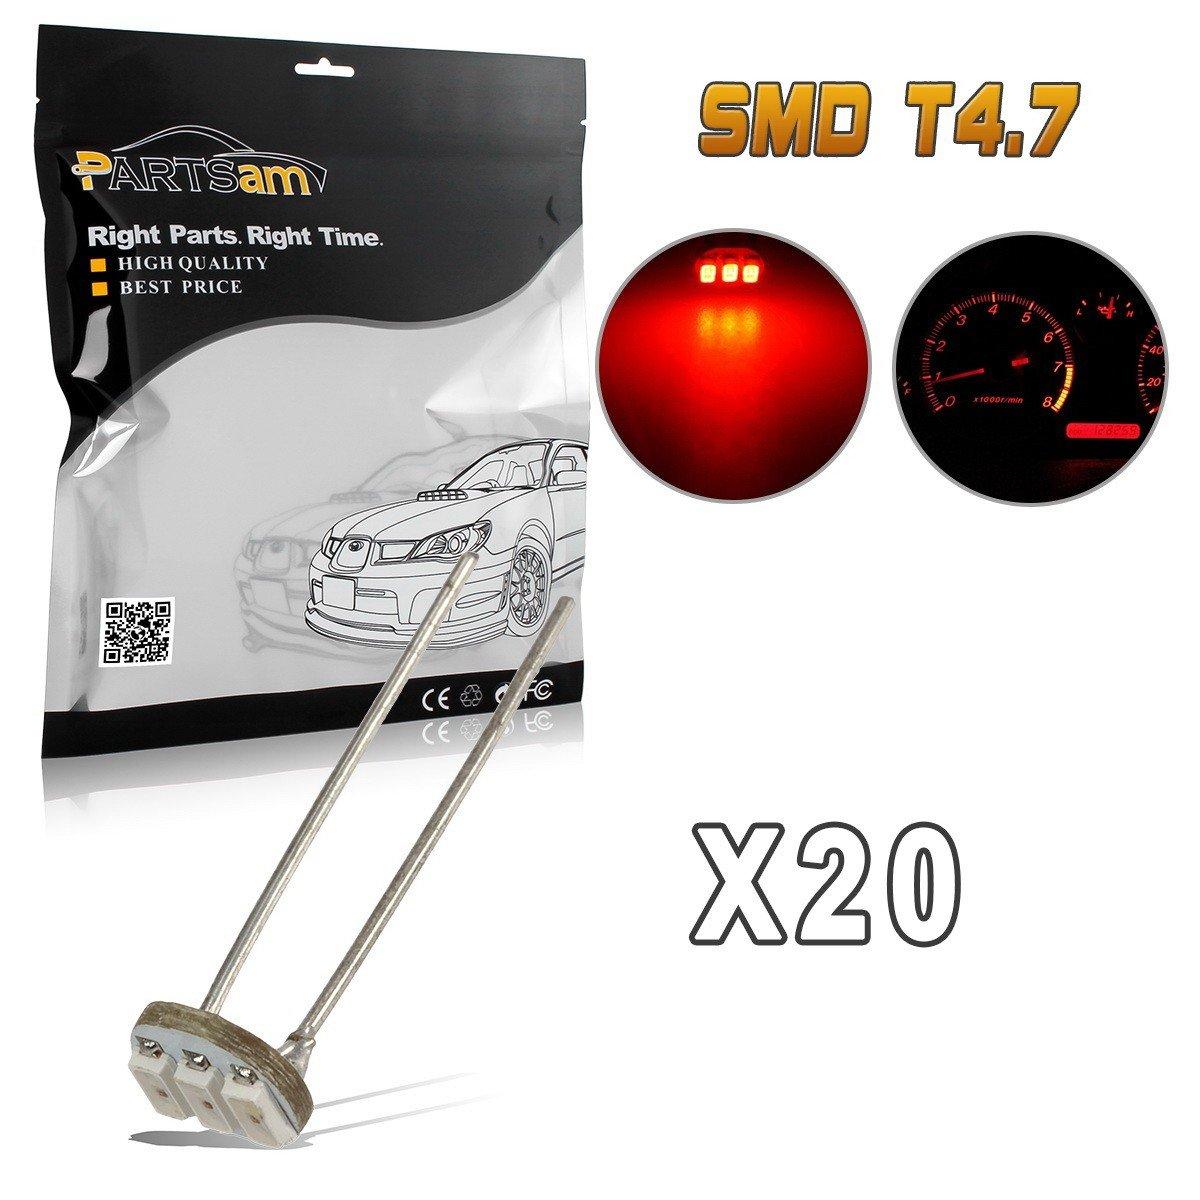 Partsam 20Pcs 4.7mm-12v Car Red Mini Bulbs Lamps Indicator Cluster Speedometer Backlight Lighting For GM GMC